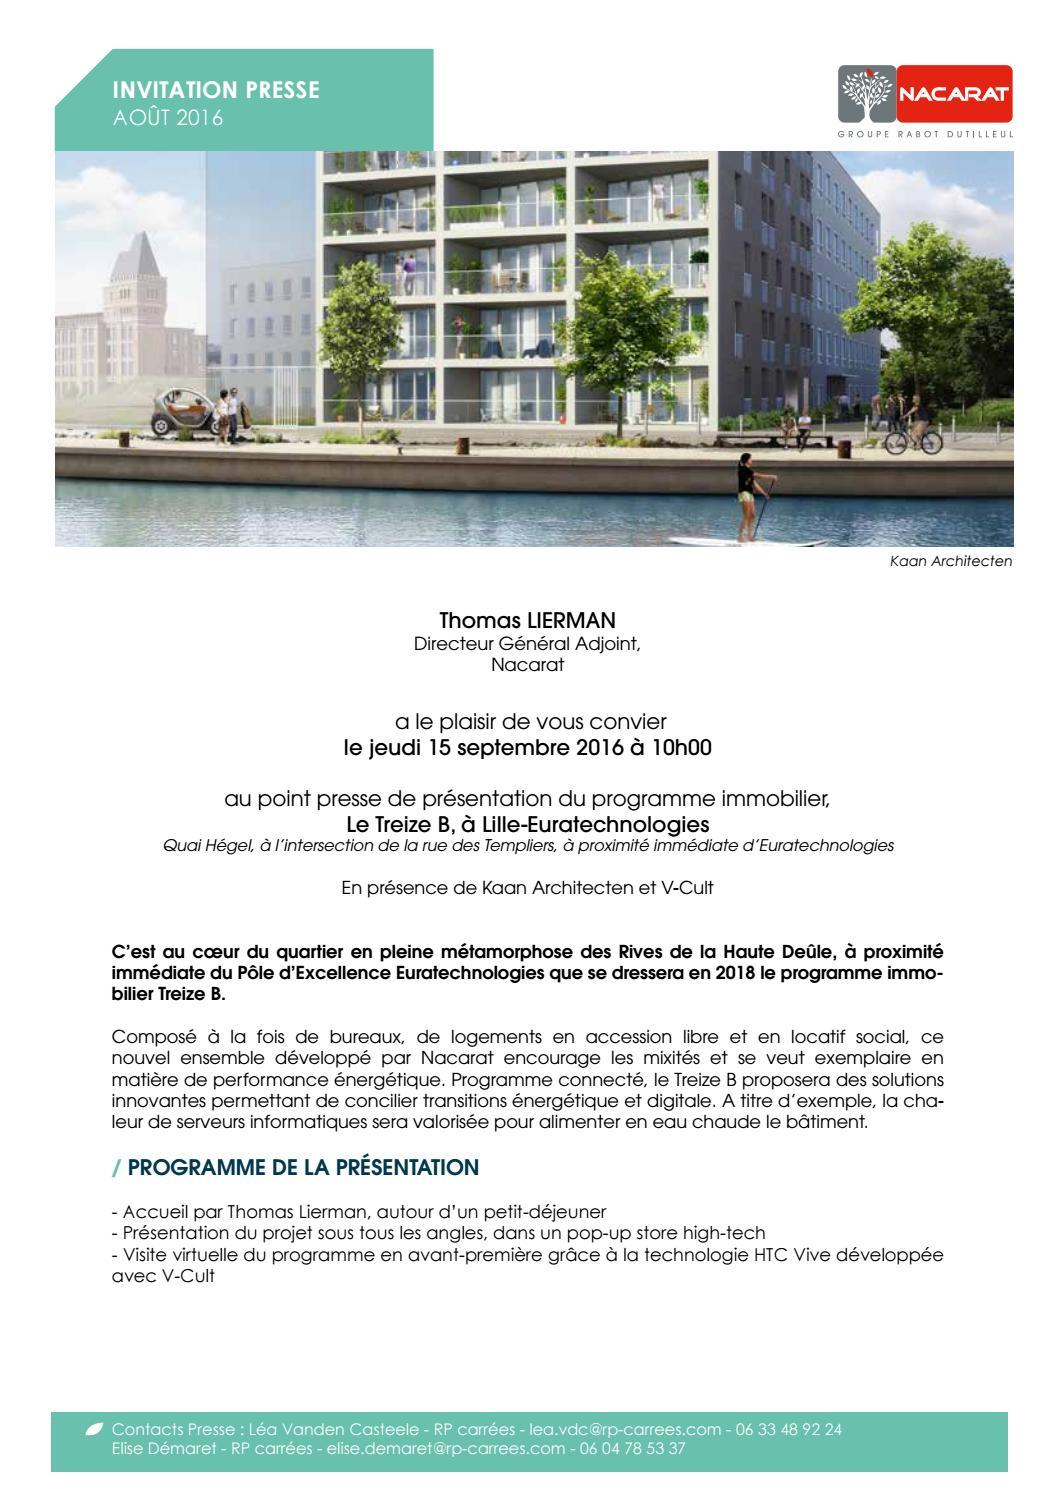 Invitation Presse Treize B By Nacarat Immo Issuu